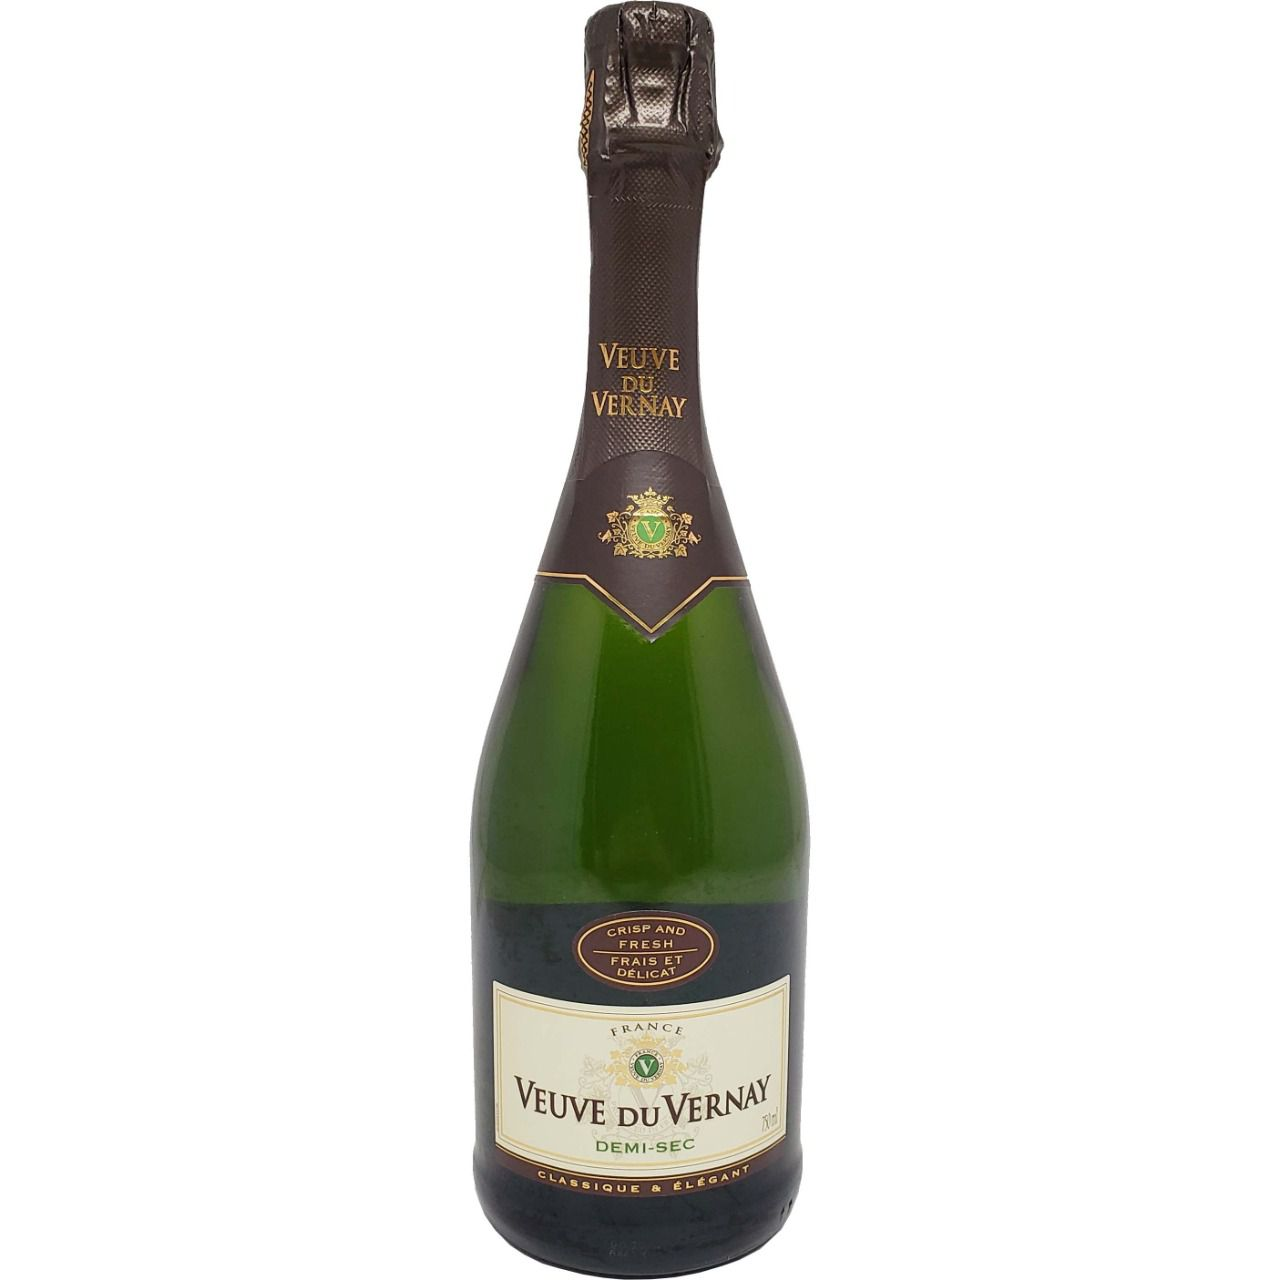 Vinho Espumante Branco Veuve Du Vernay Demi-Sec - 750ml -